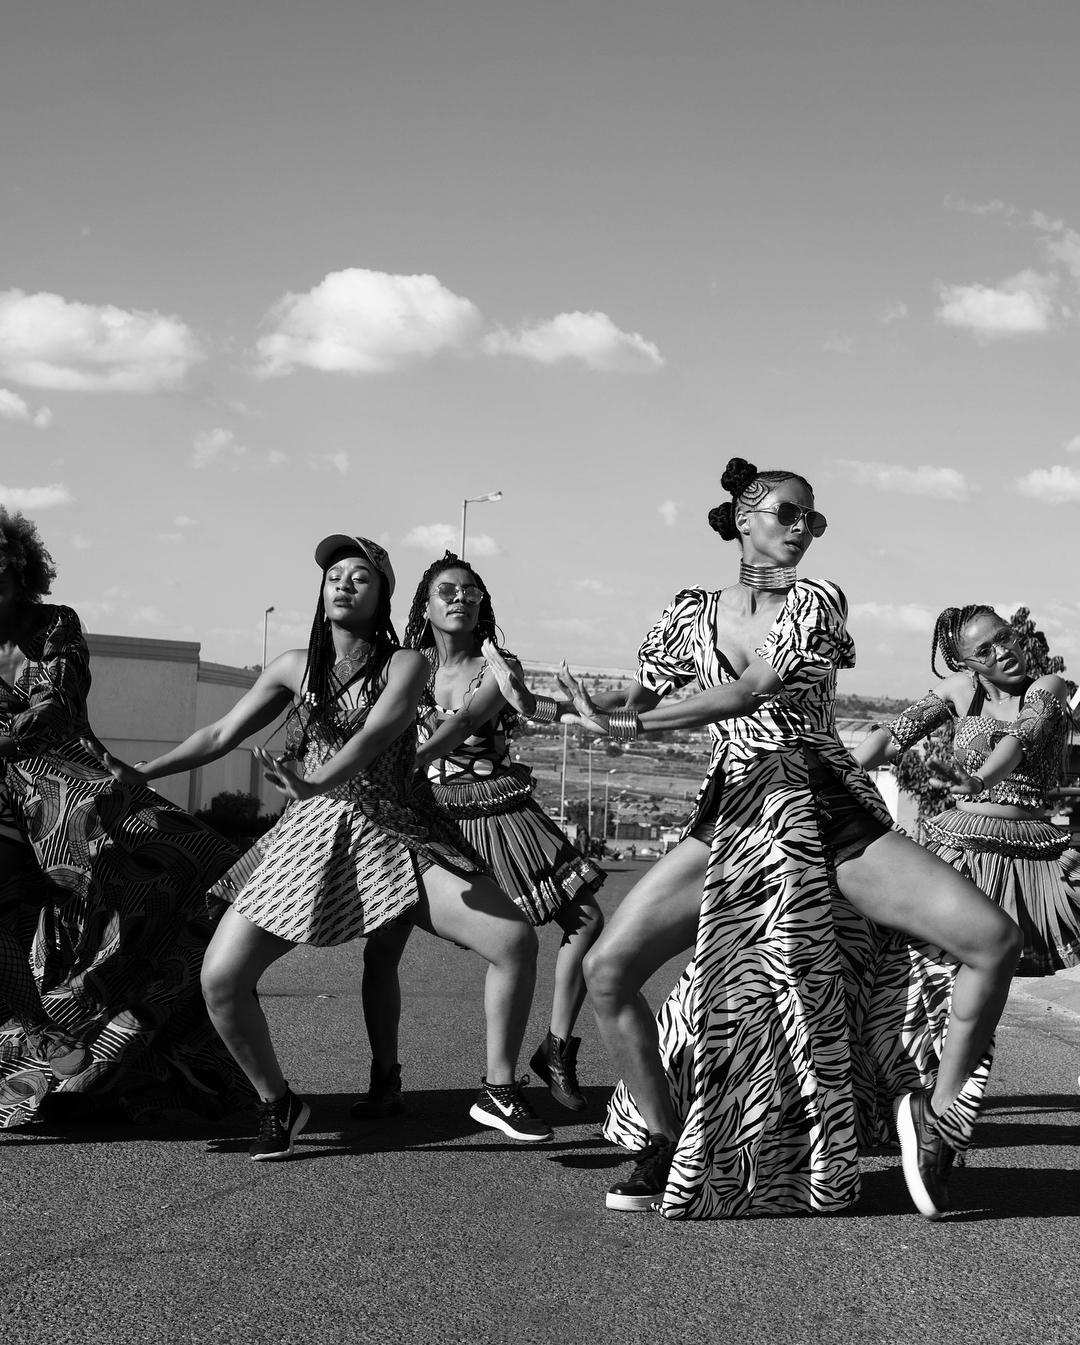 Trevor Stuurman, Rich Mnisi Are Creative Forces Behind Ciara's Freak Me Video